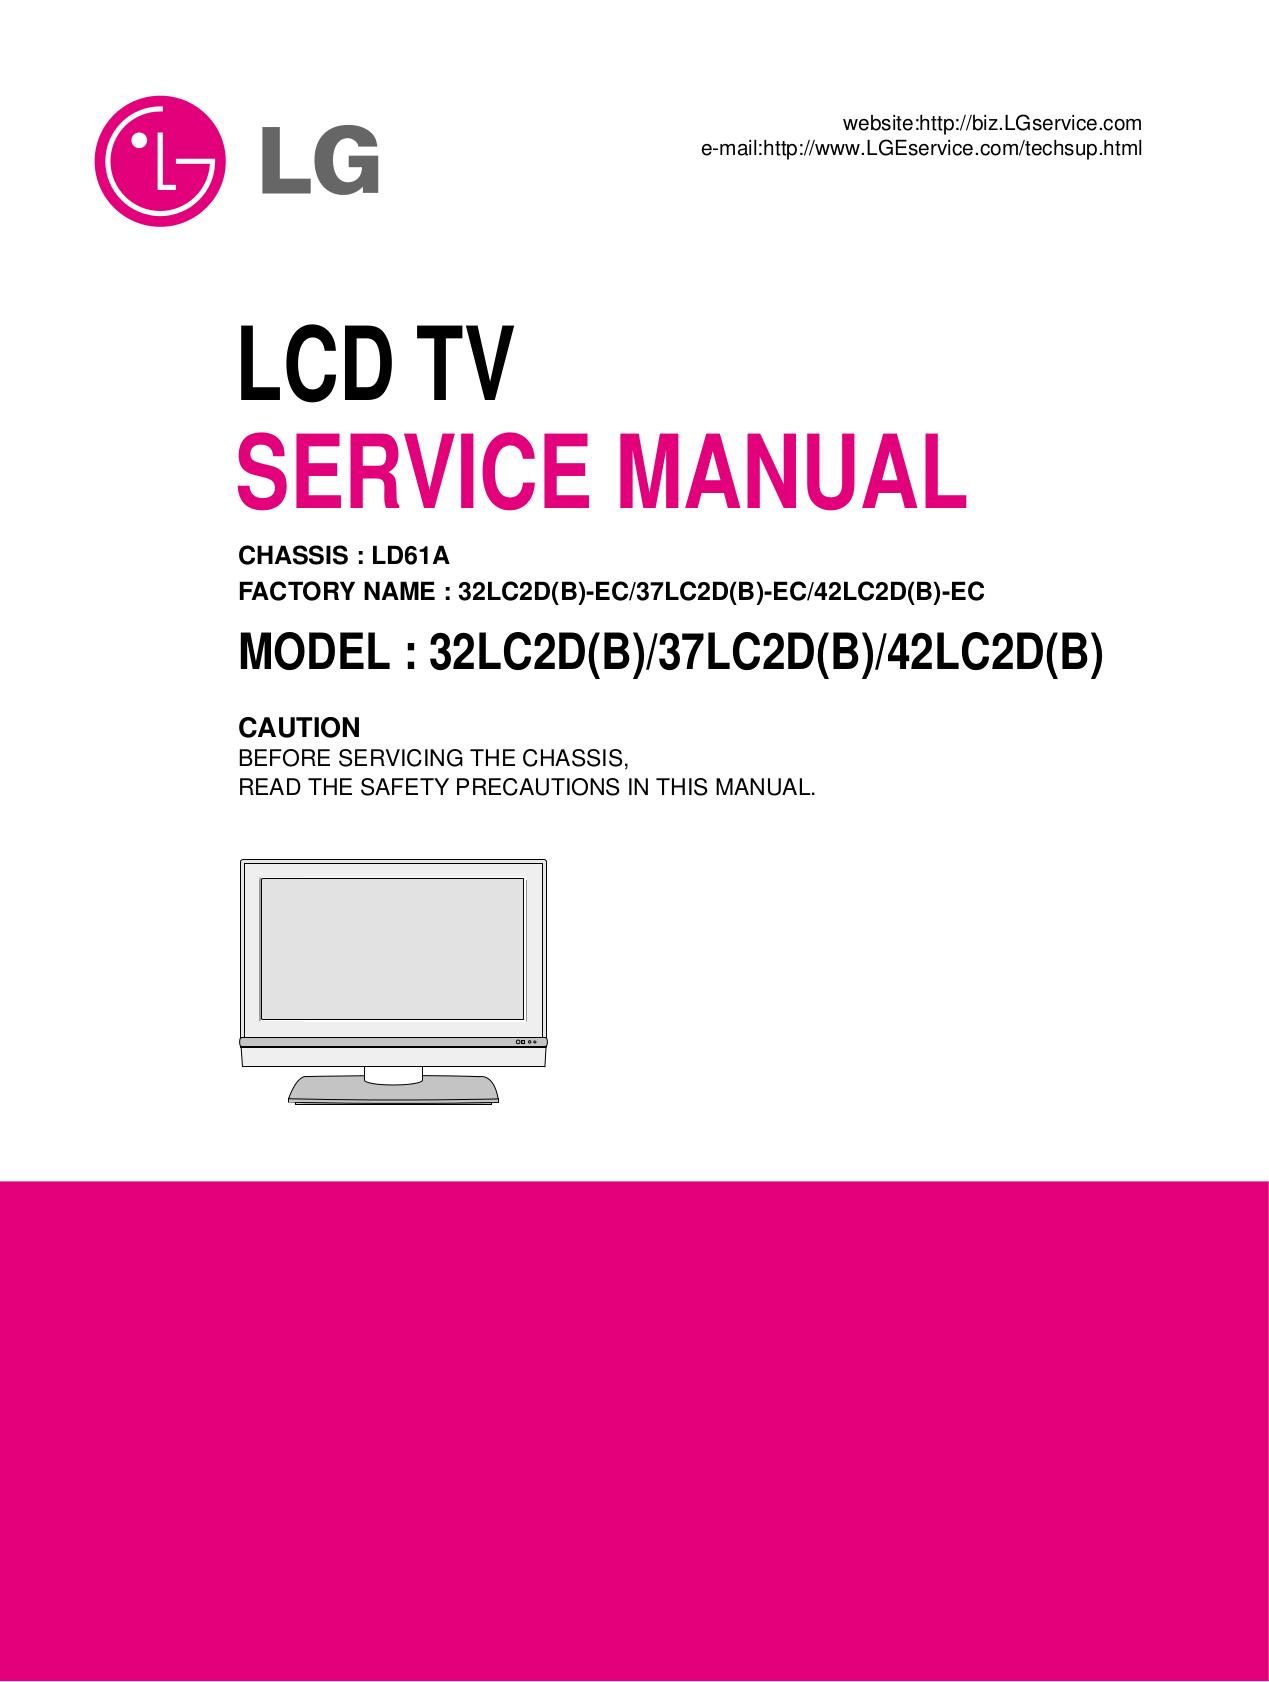 download free pdf for lg 42lc2d tv manual rh umlib com lg 42lc2d lcd tv manual LG TV Parts